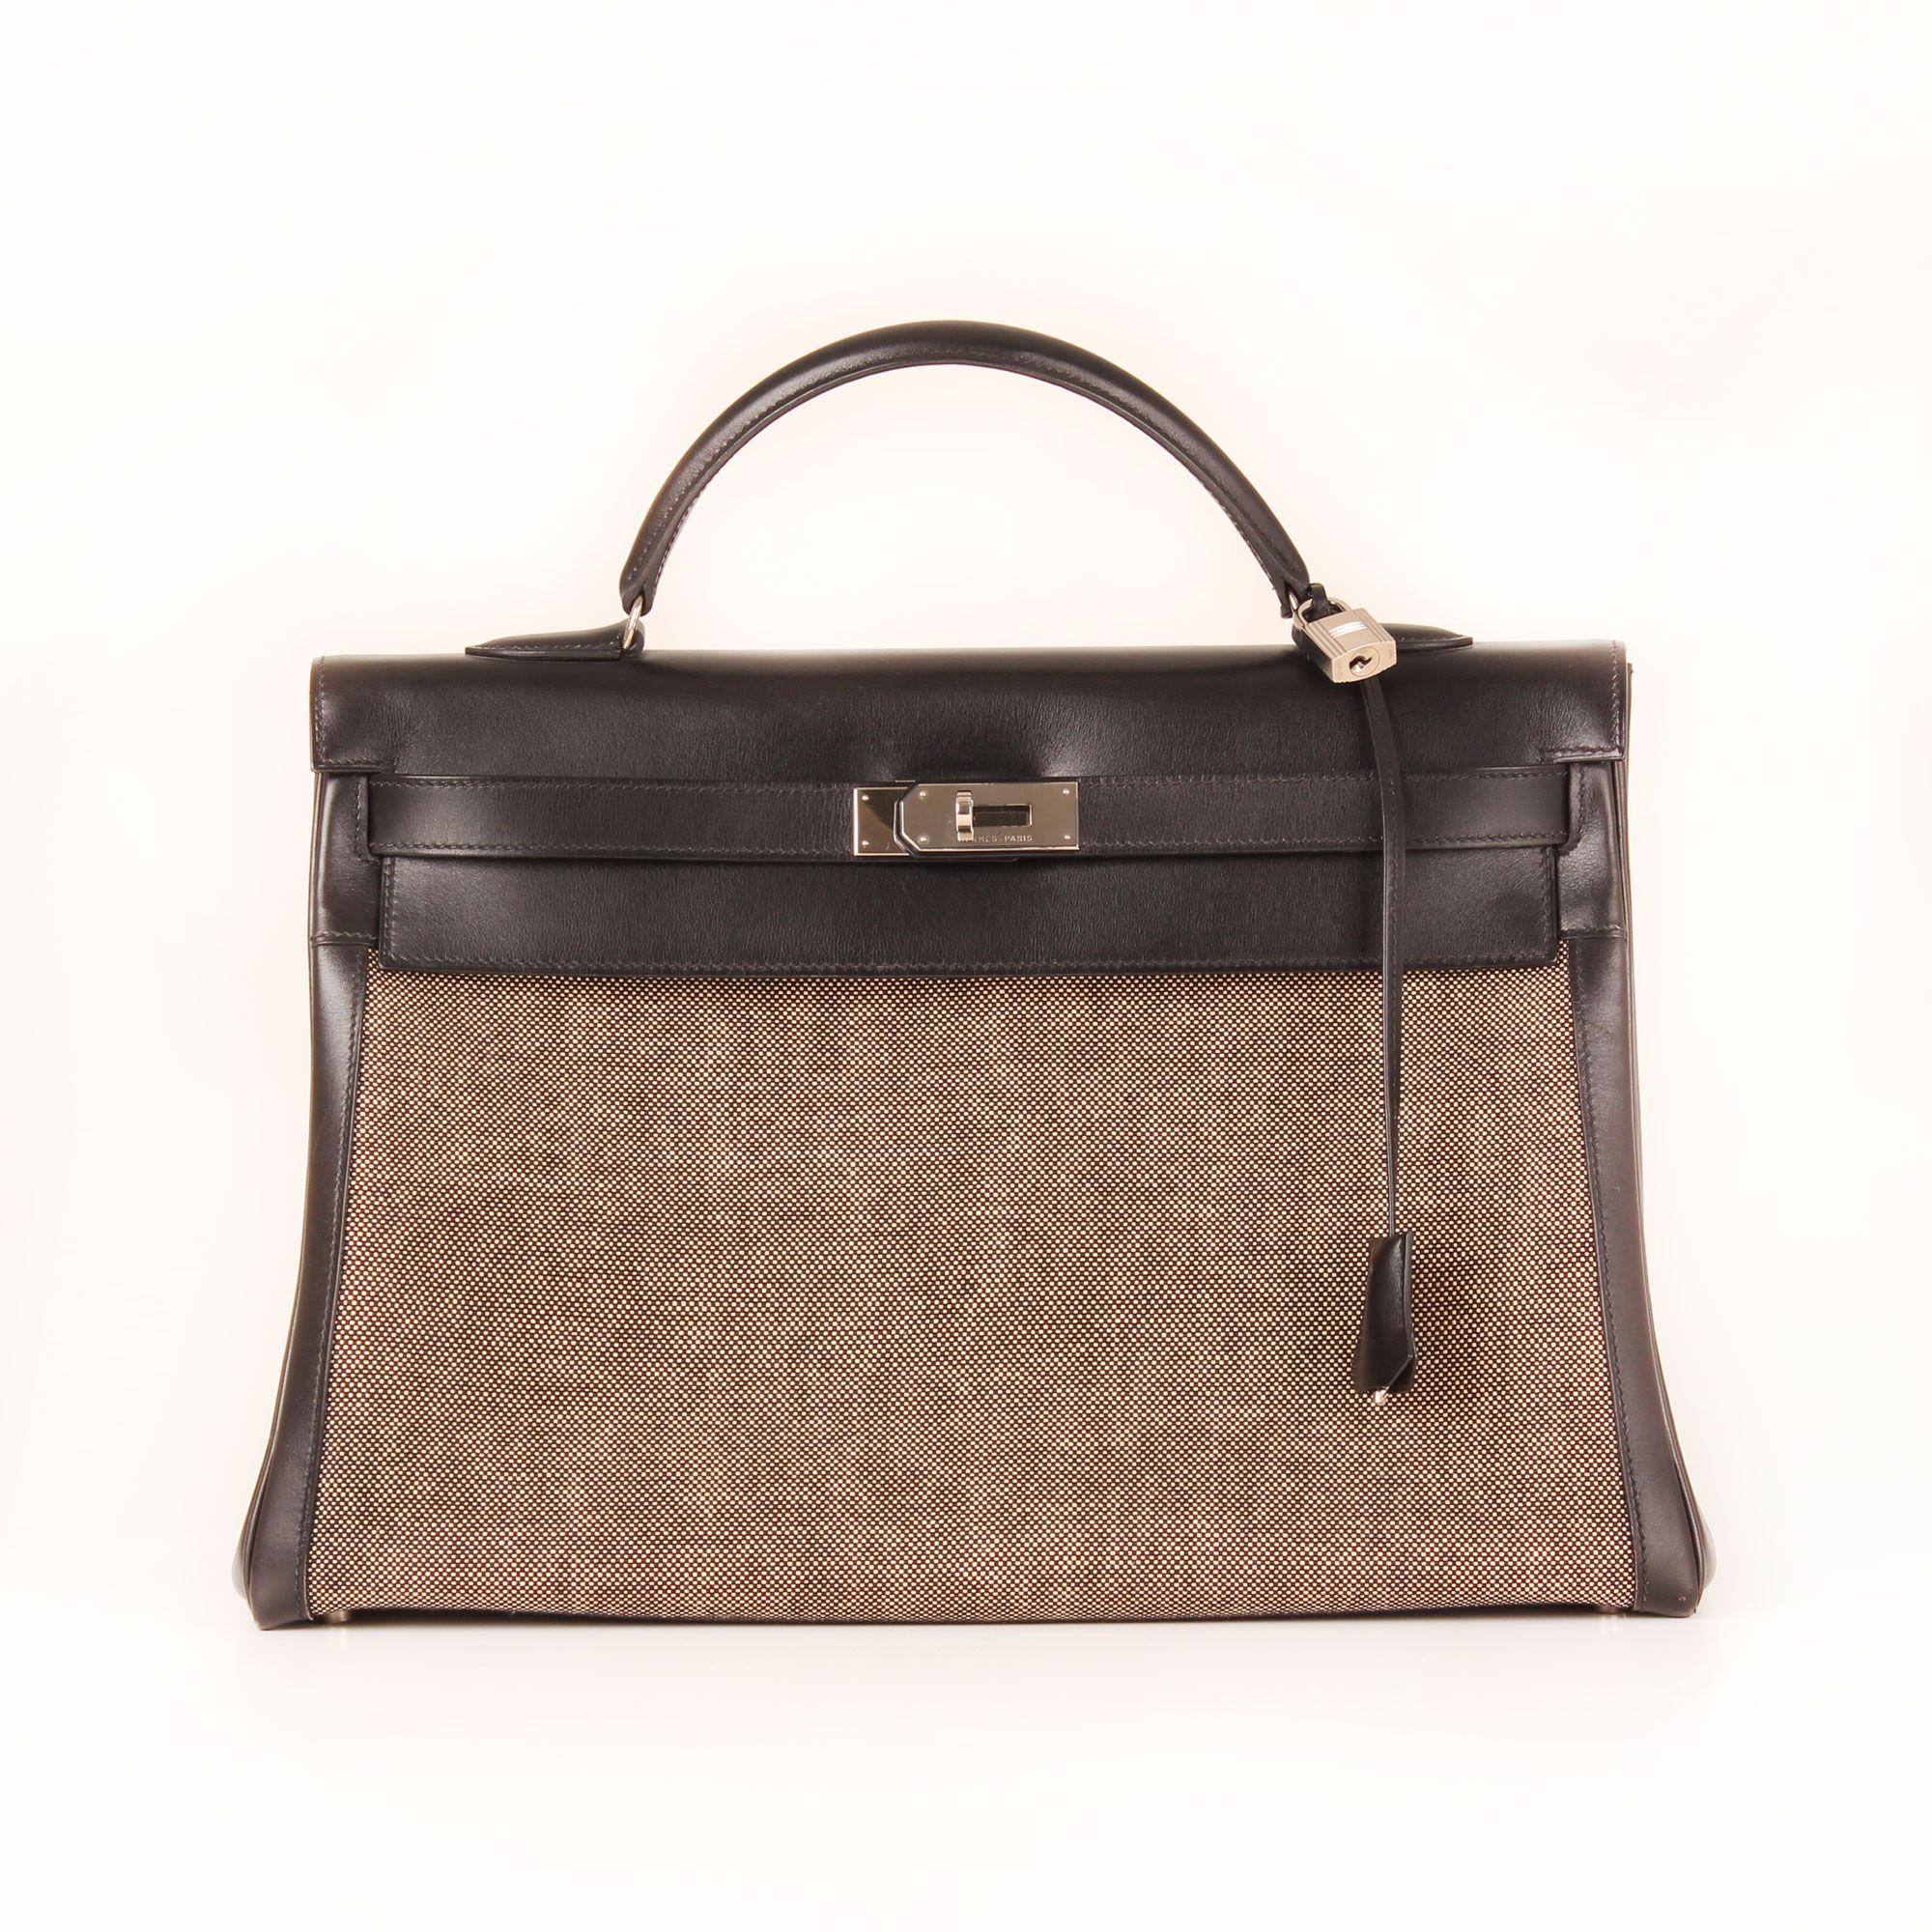 6b580d50a5e hermes-bag-kelly-40-canvas-black-leather